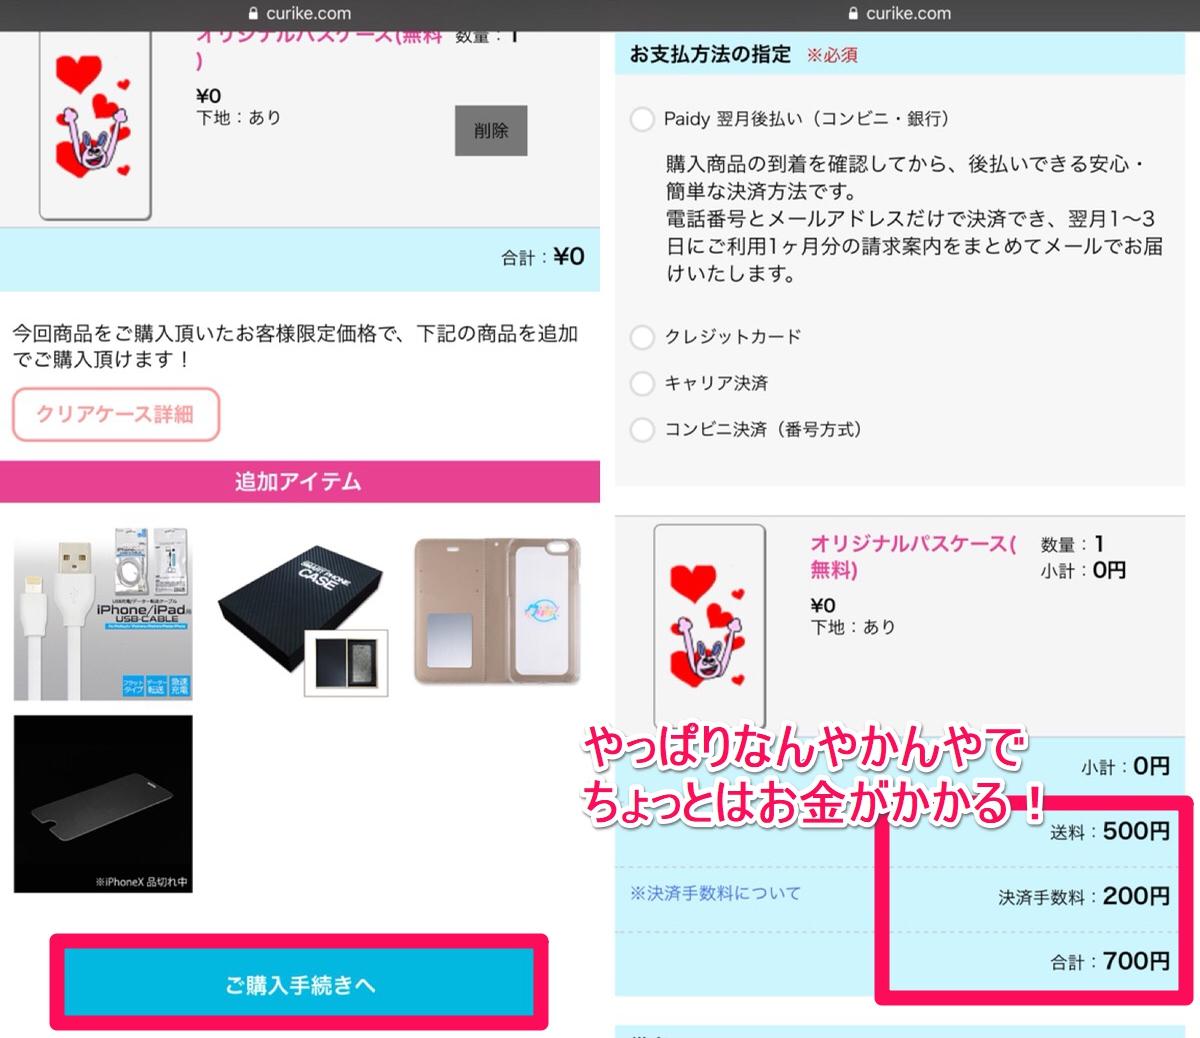 curike(クリケ)の期間限定0円オリジナルパスケースの購入手続き